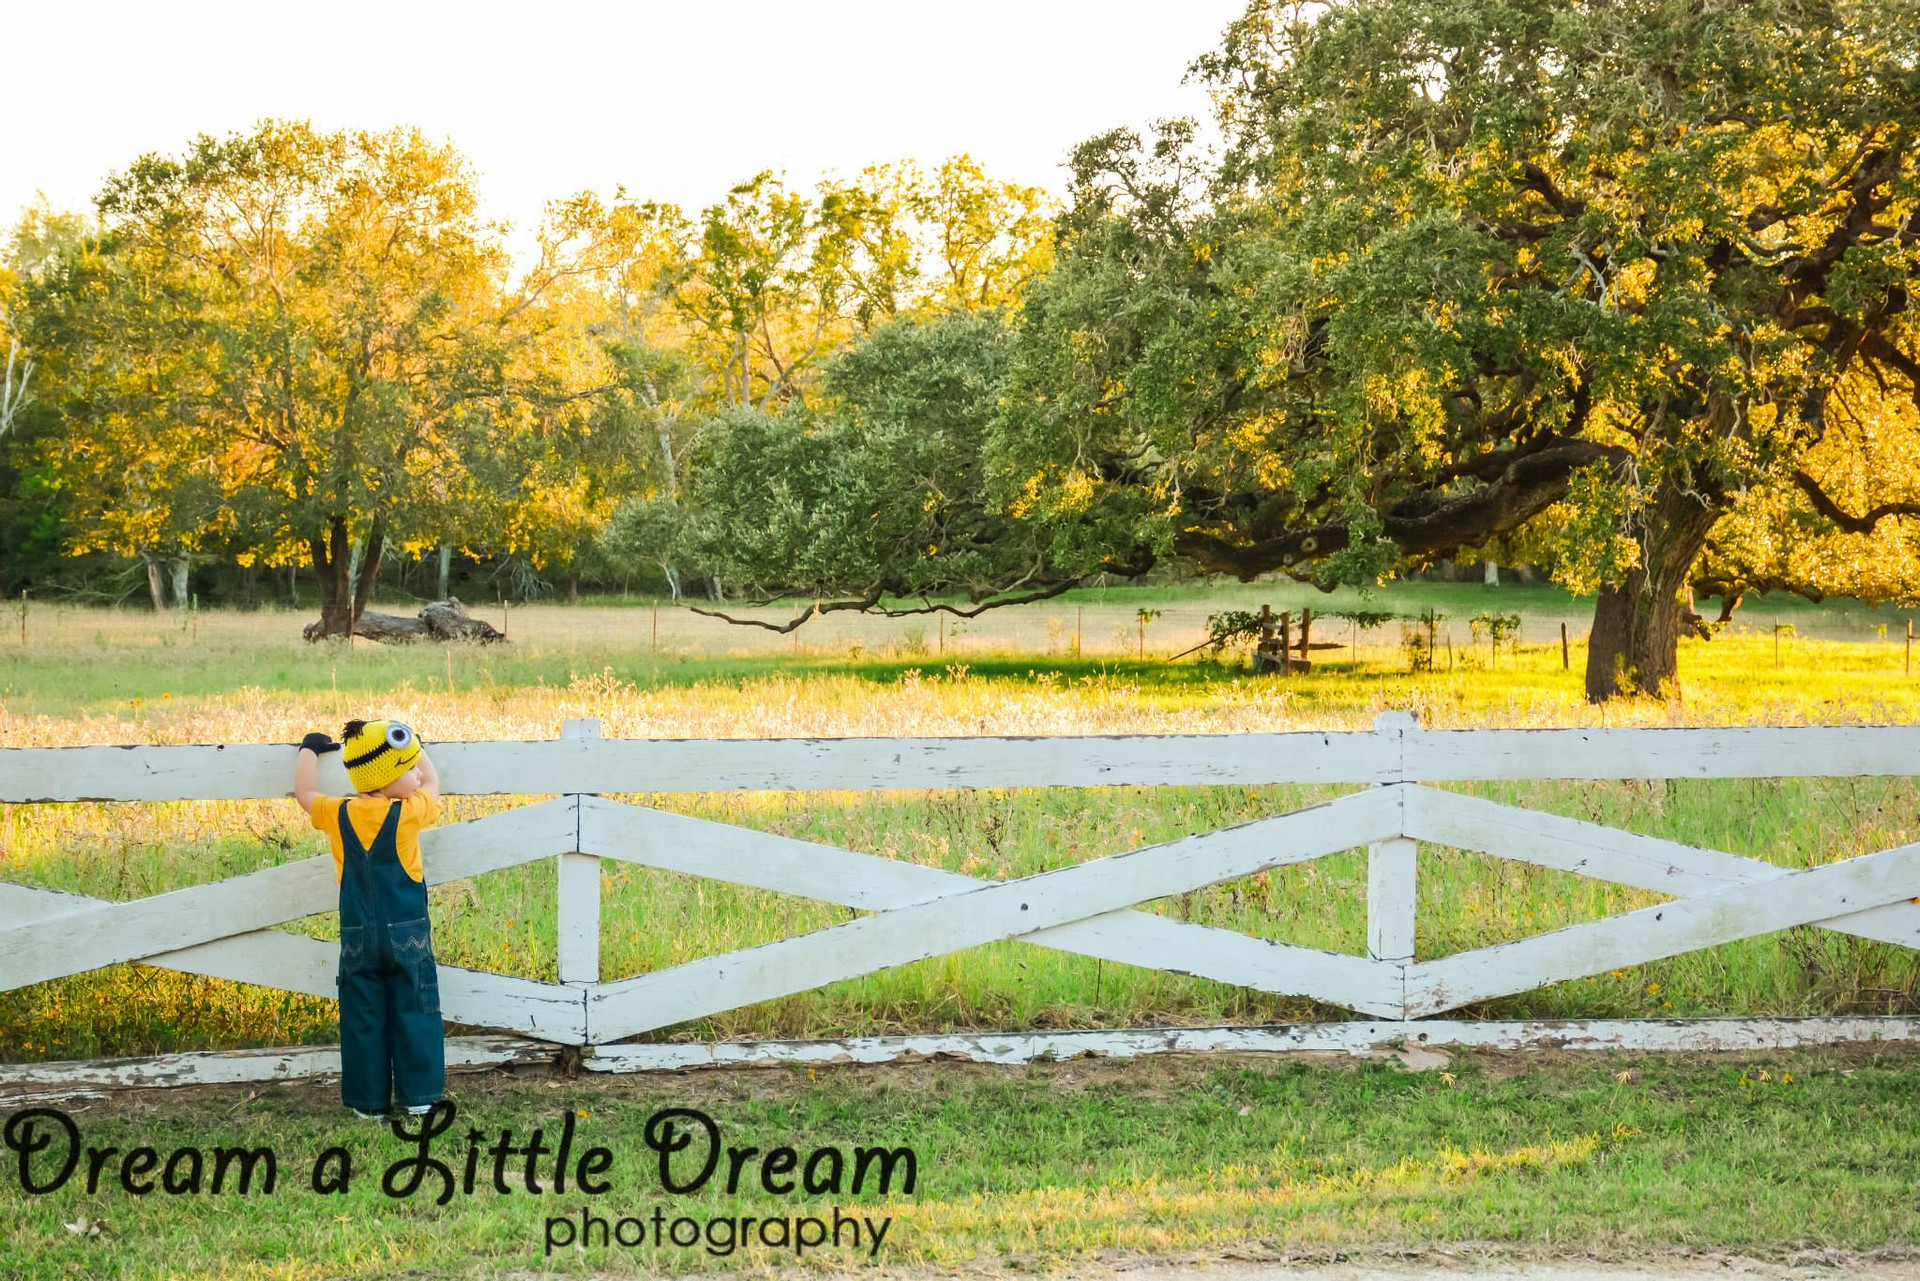 dream a little dream photography